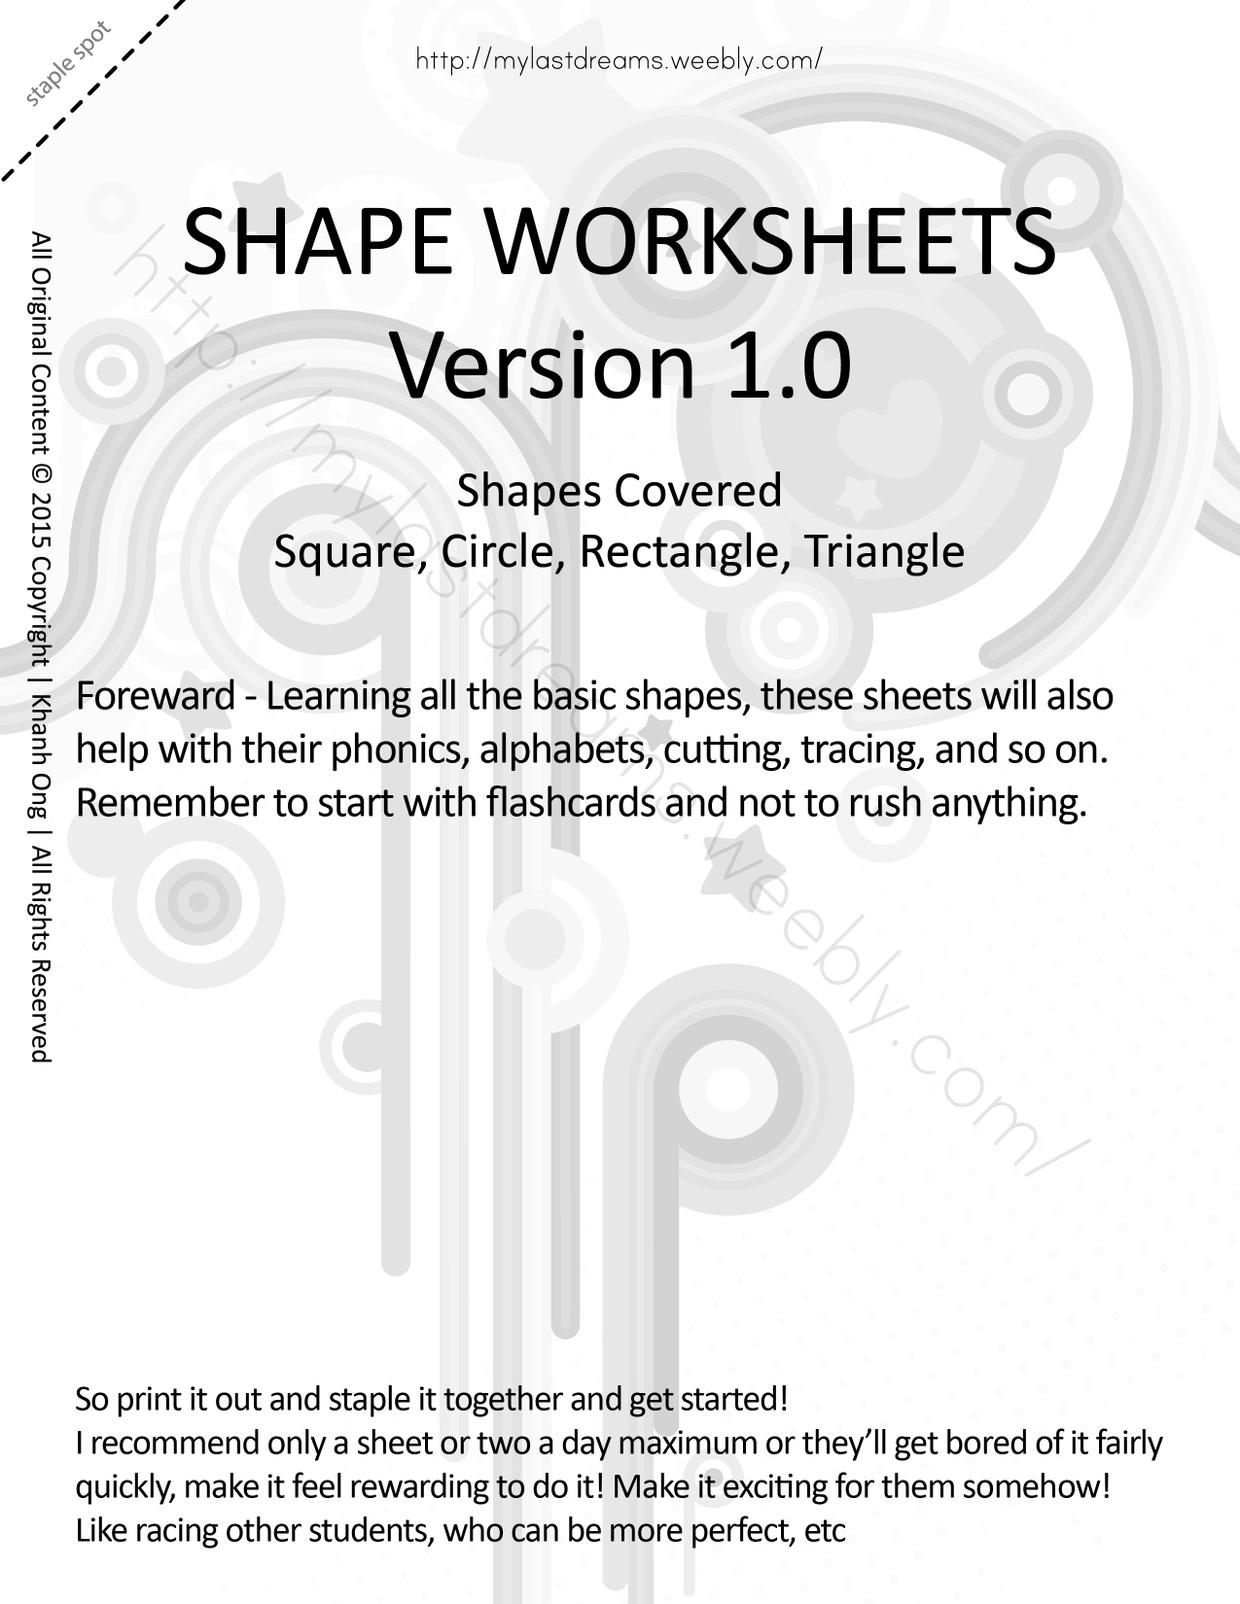 MLD - Basic Shapes Worksheets - Full Set - Letter Sized